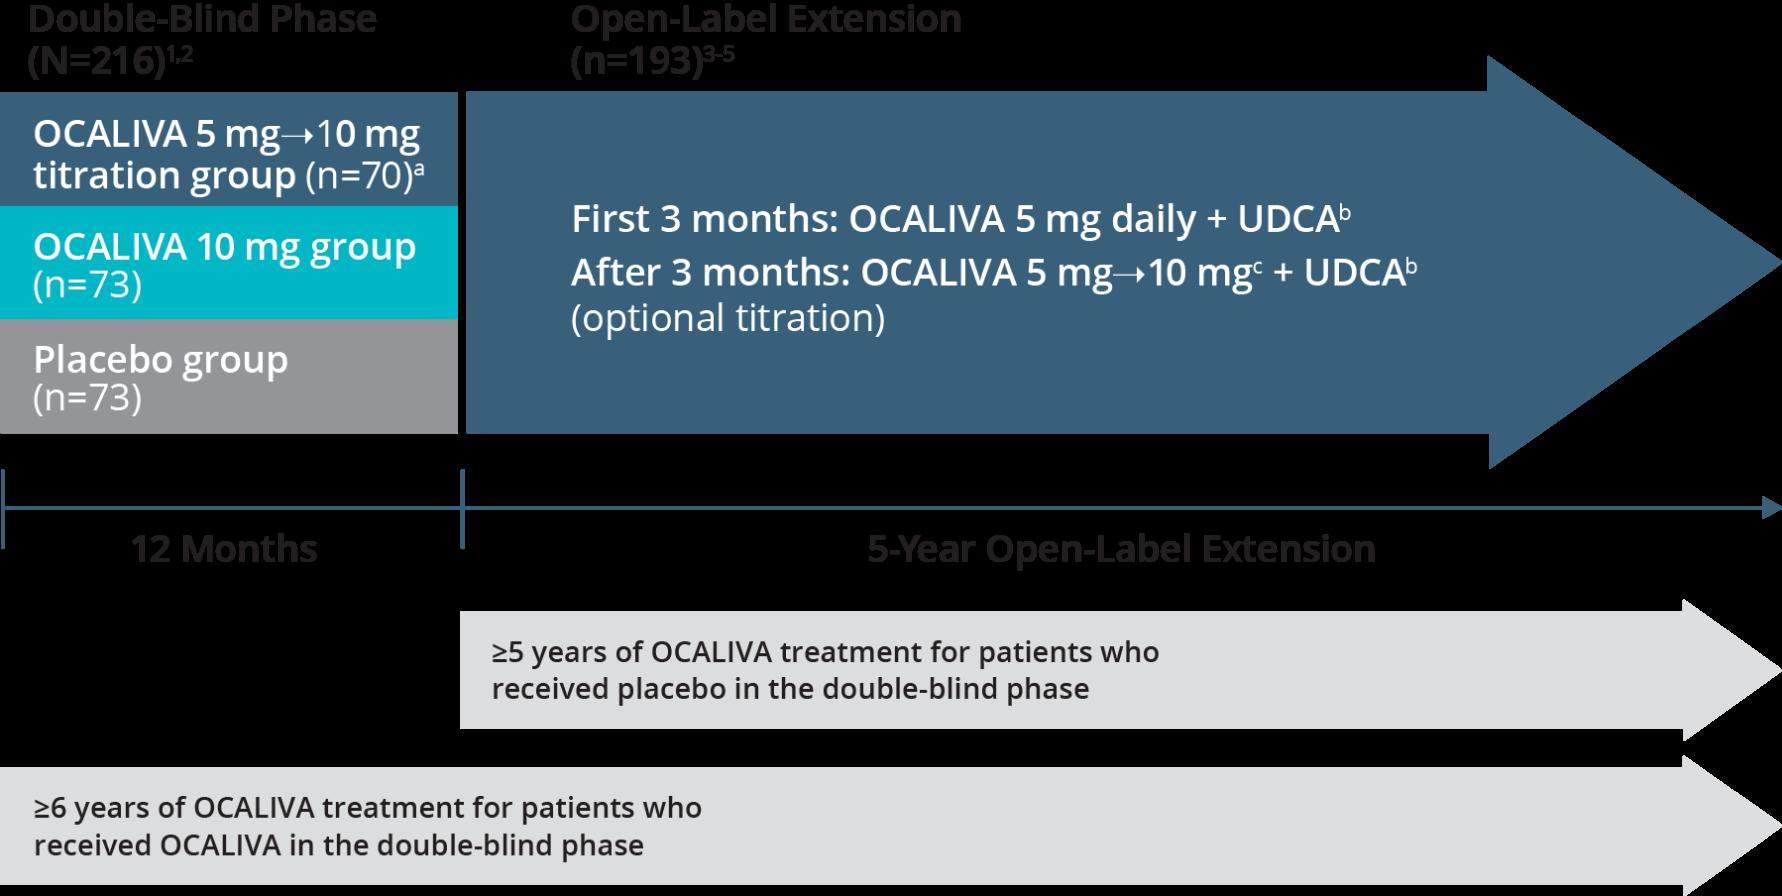 OCALIVA® (obeticholic acid) open-label extension study design chart